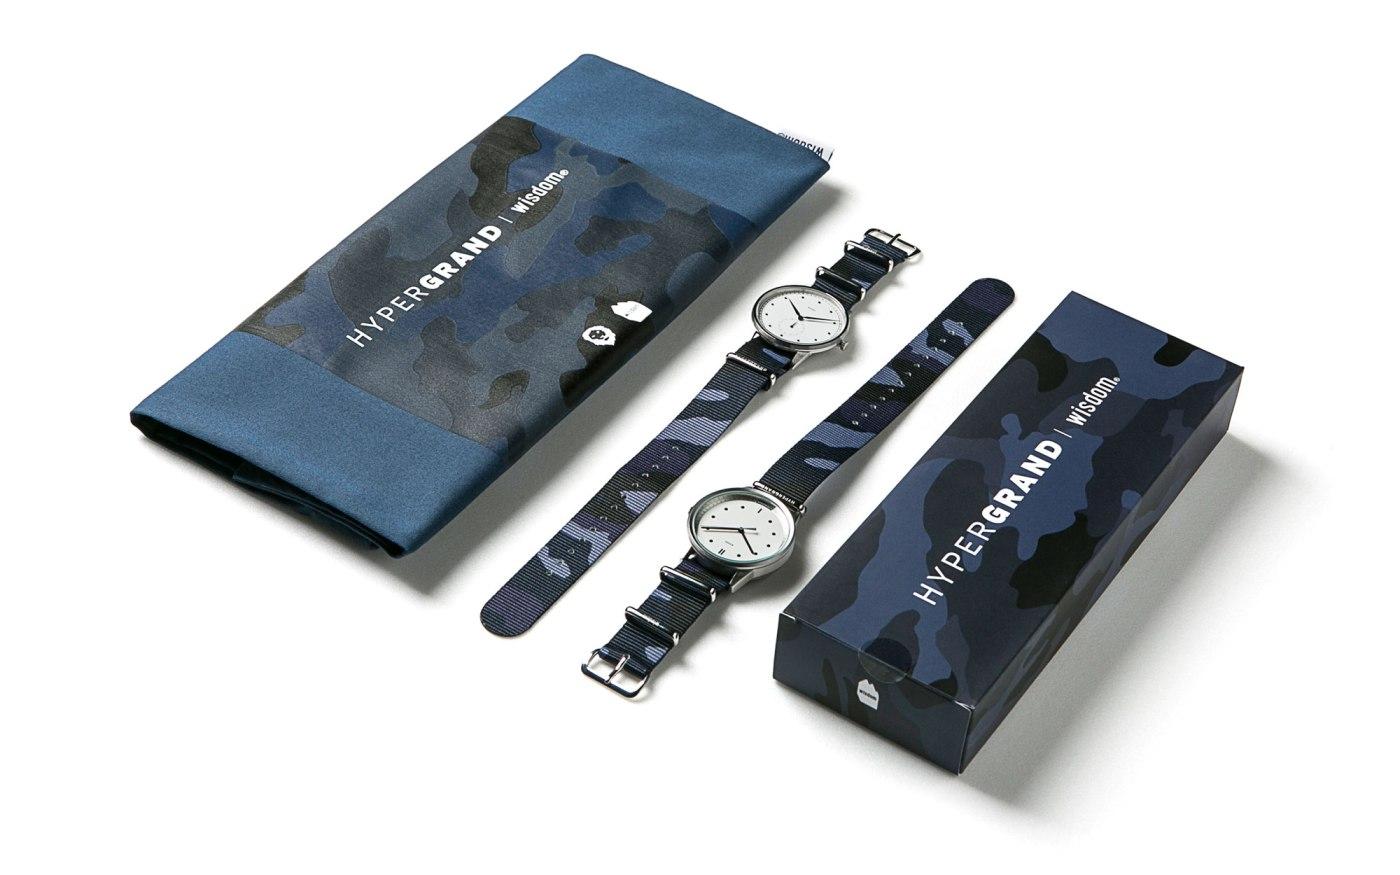 wisdom-x-hypergrand-collaboration-watch-lookbook-09